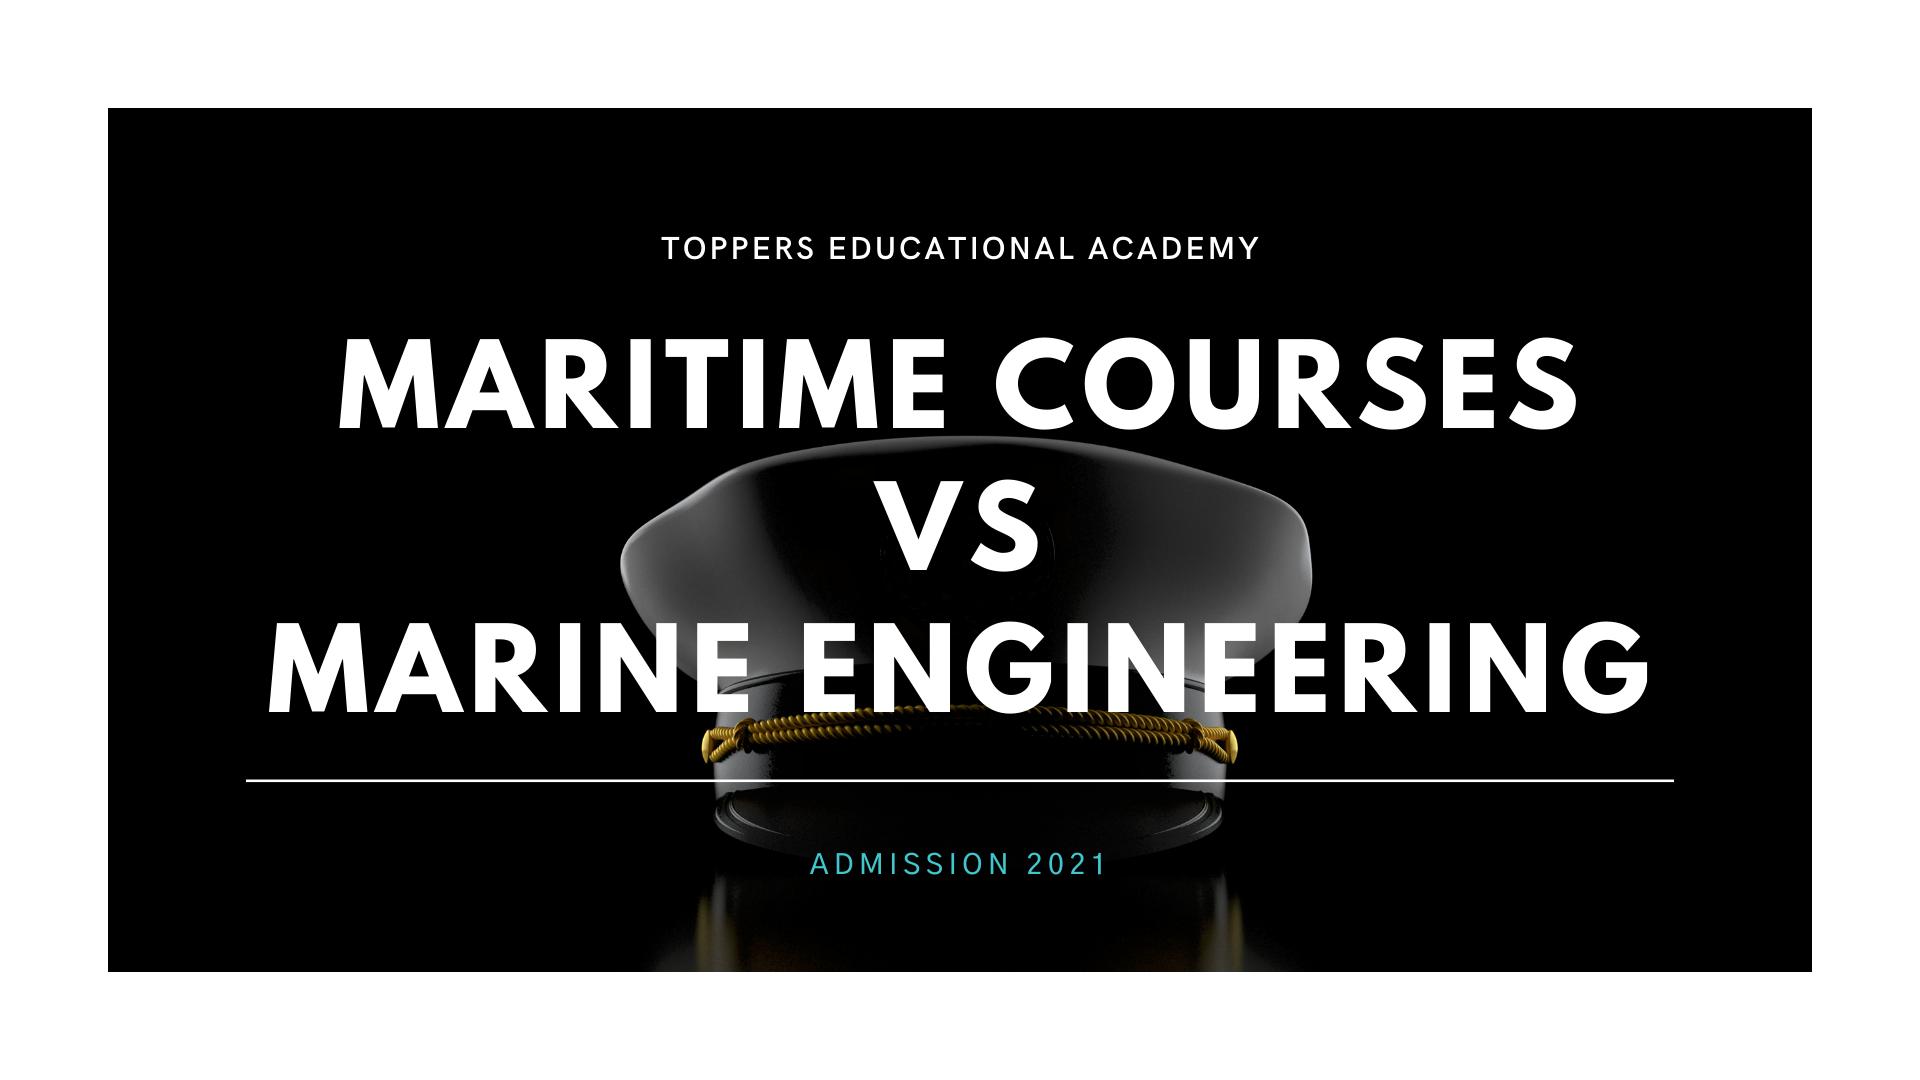 Maritime courses Vs Marine Engineering